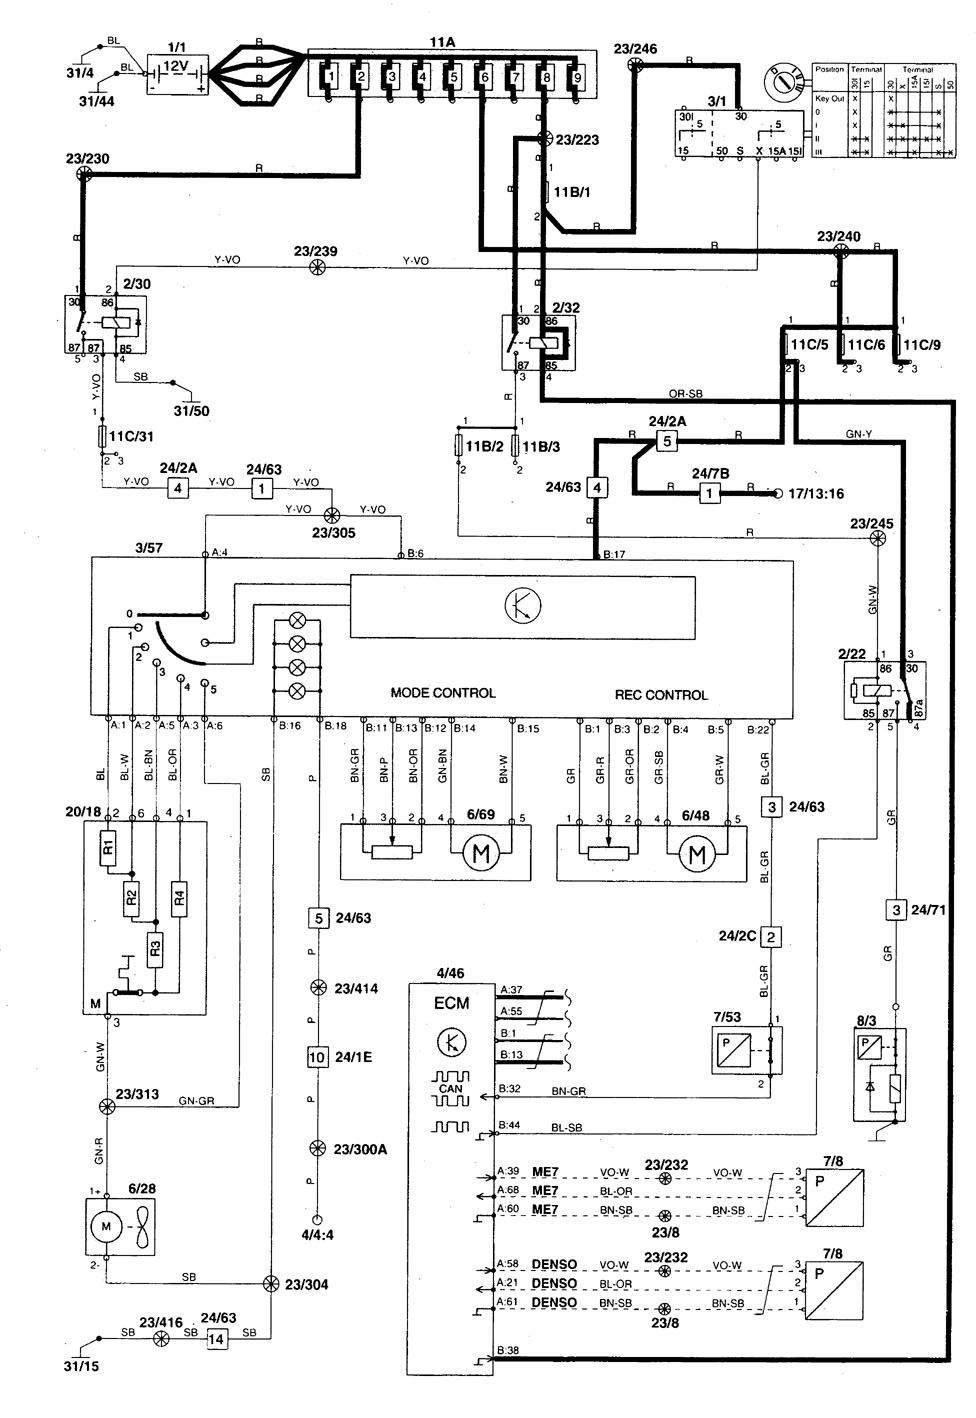 volvo s70 1998 2000 wiring diagrams heater. Black Bedroom Furniture Sets. Home Design Ideas